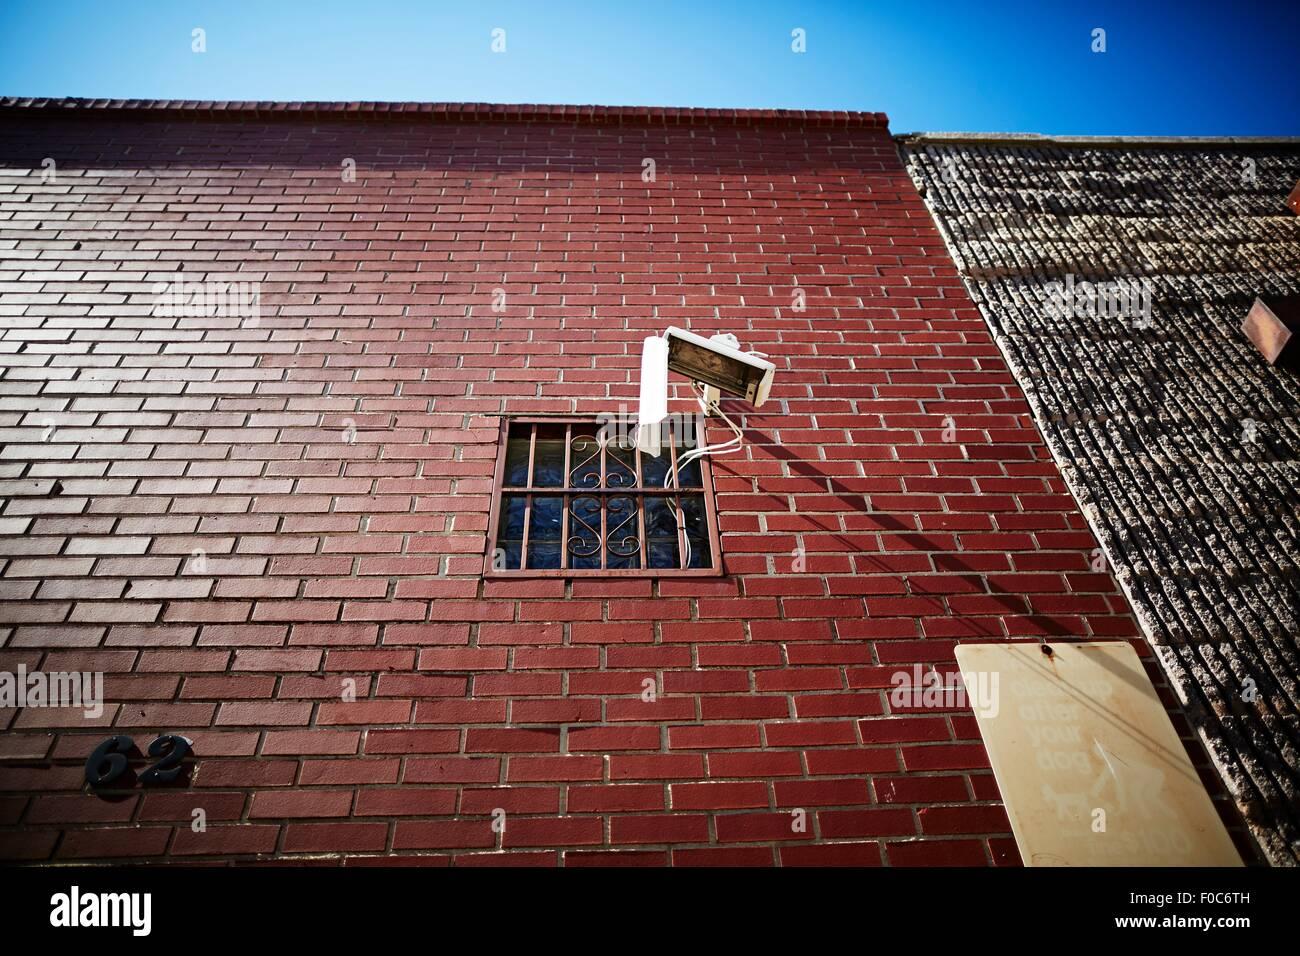 Surveillance camera on red brick wall - Stock Image